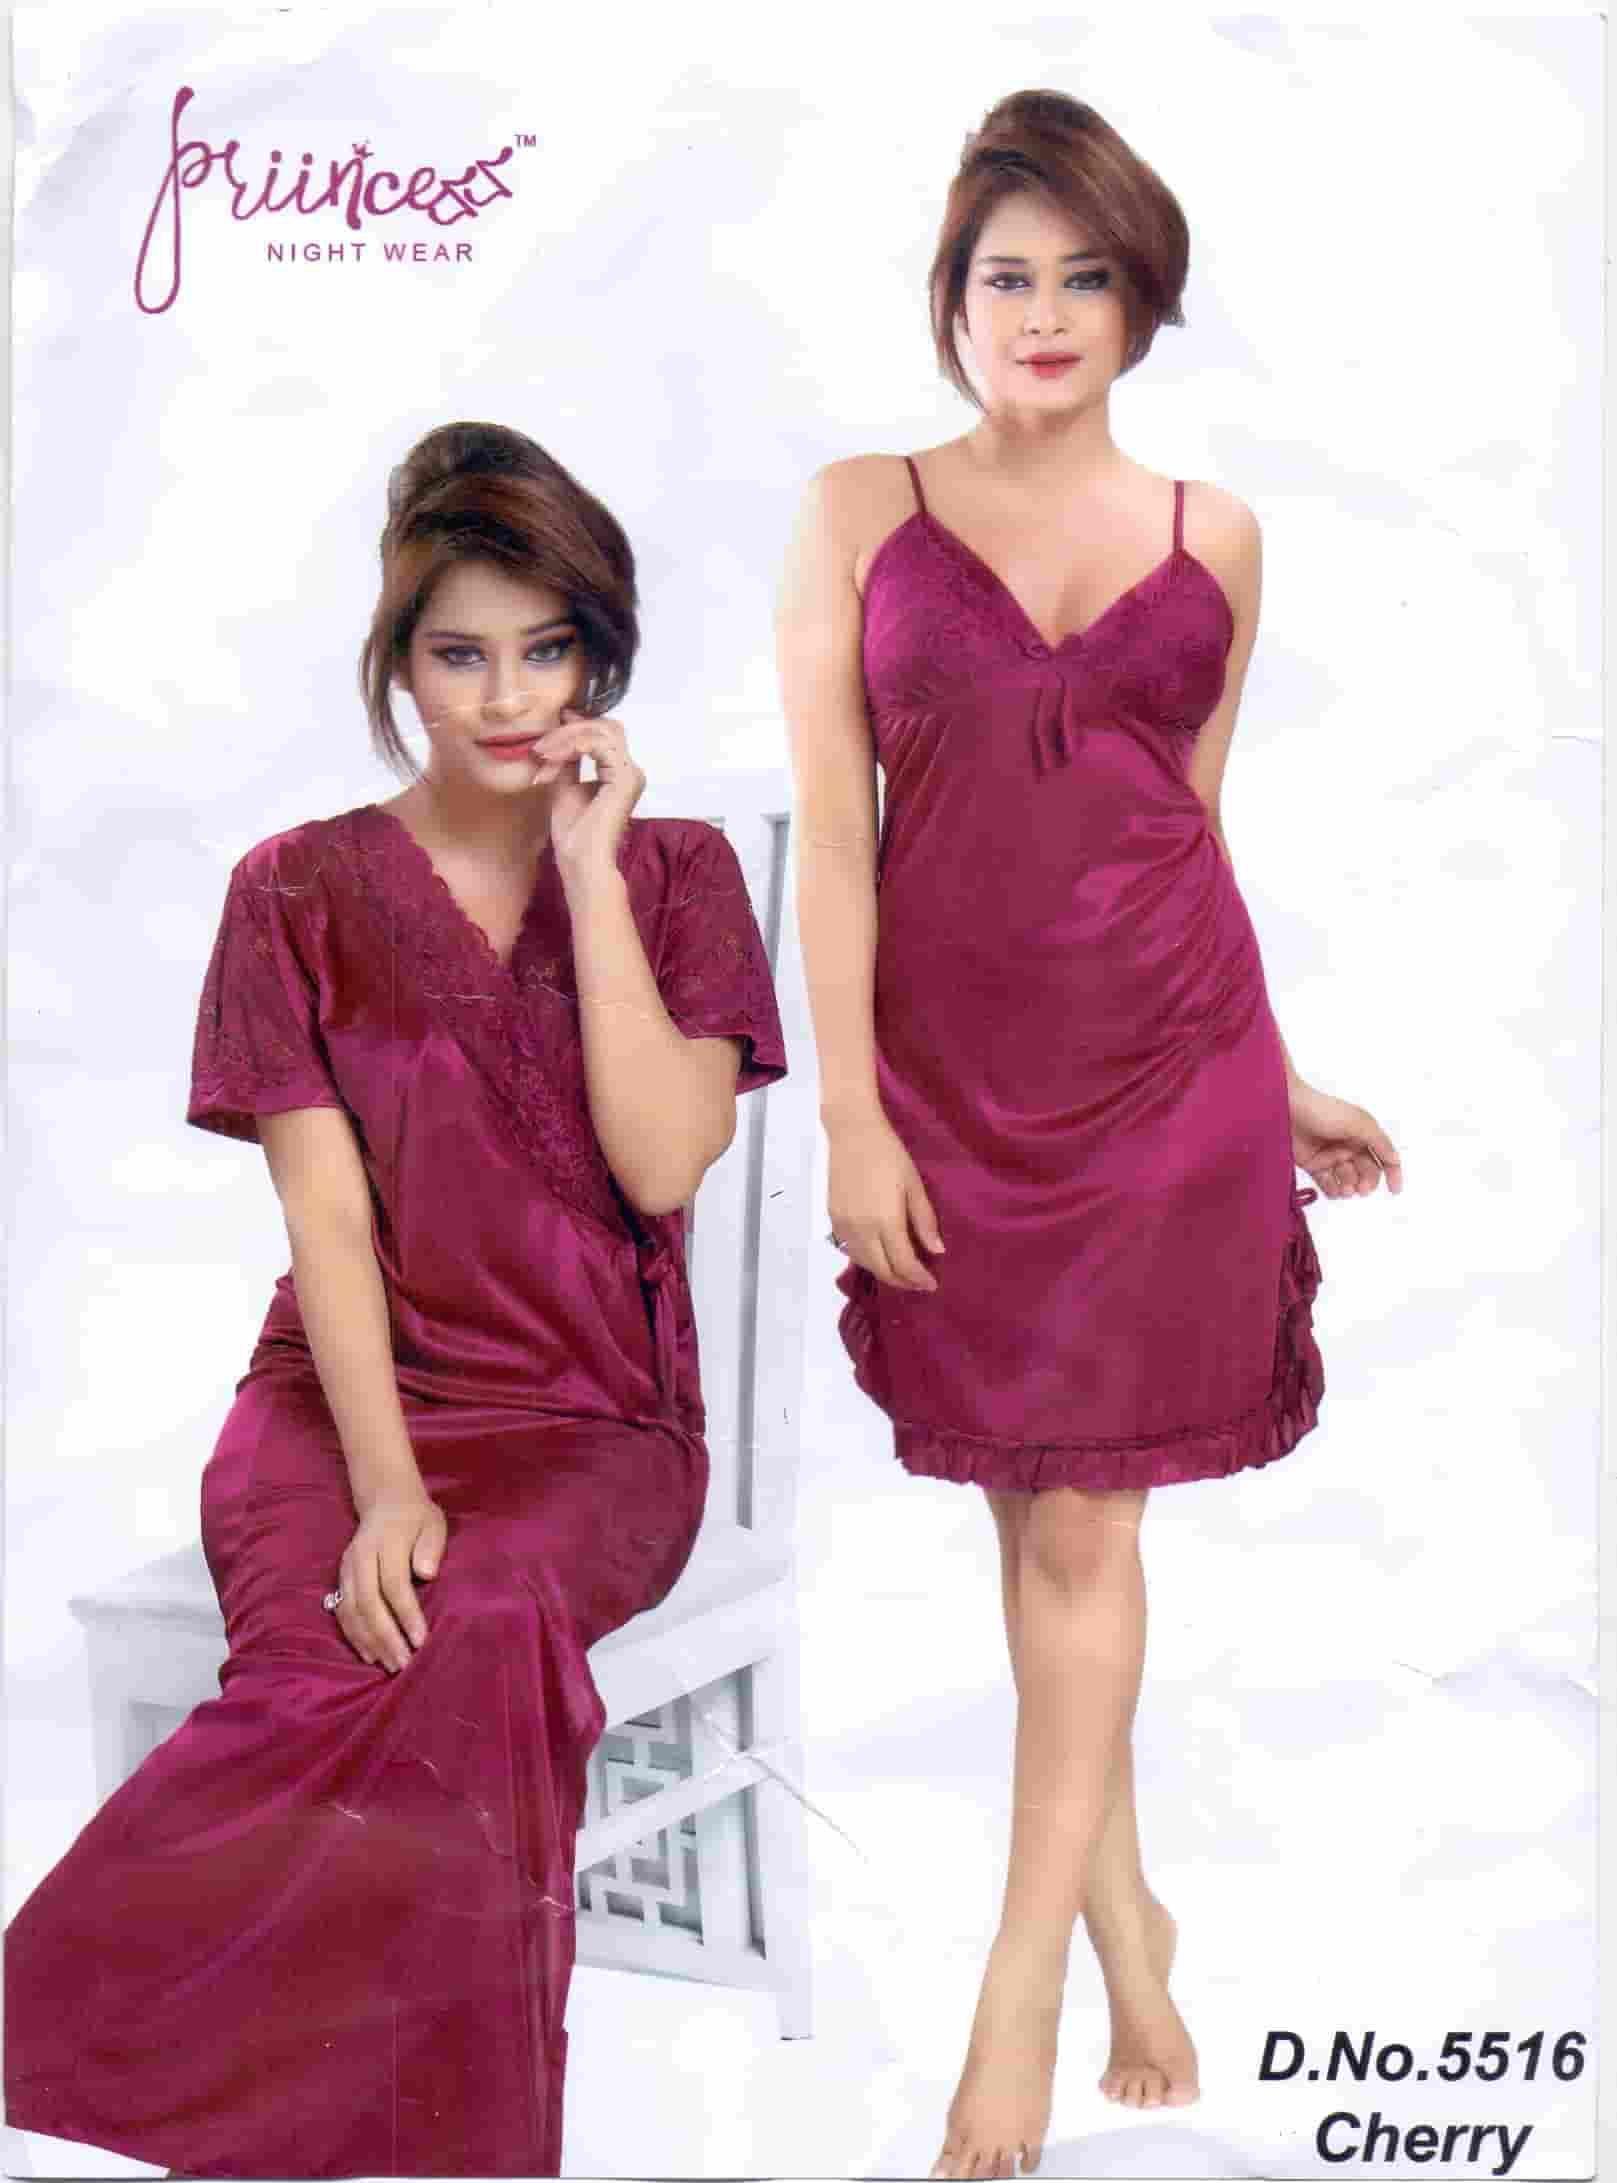 69f7056e79 Women s Latest Fashion Wear Online Shopping in Bangladesh